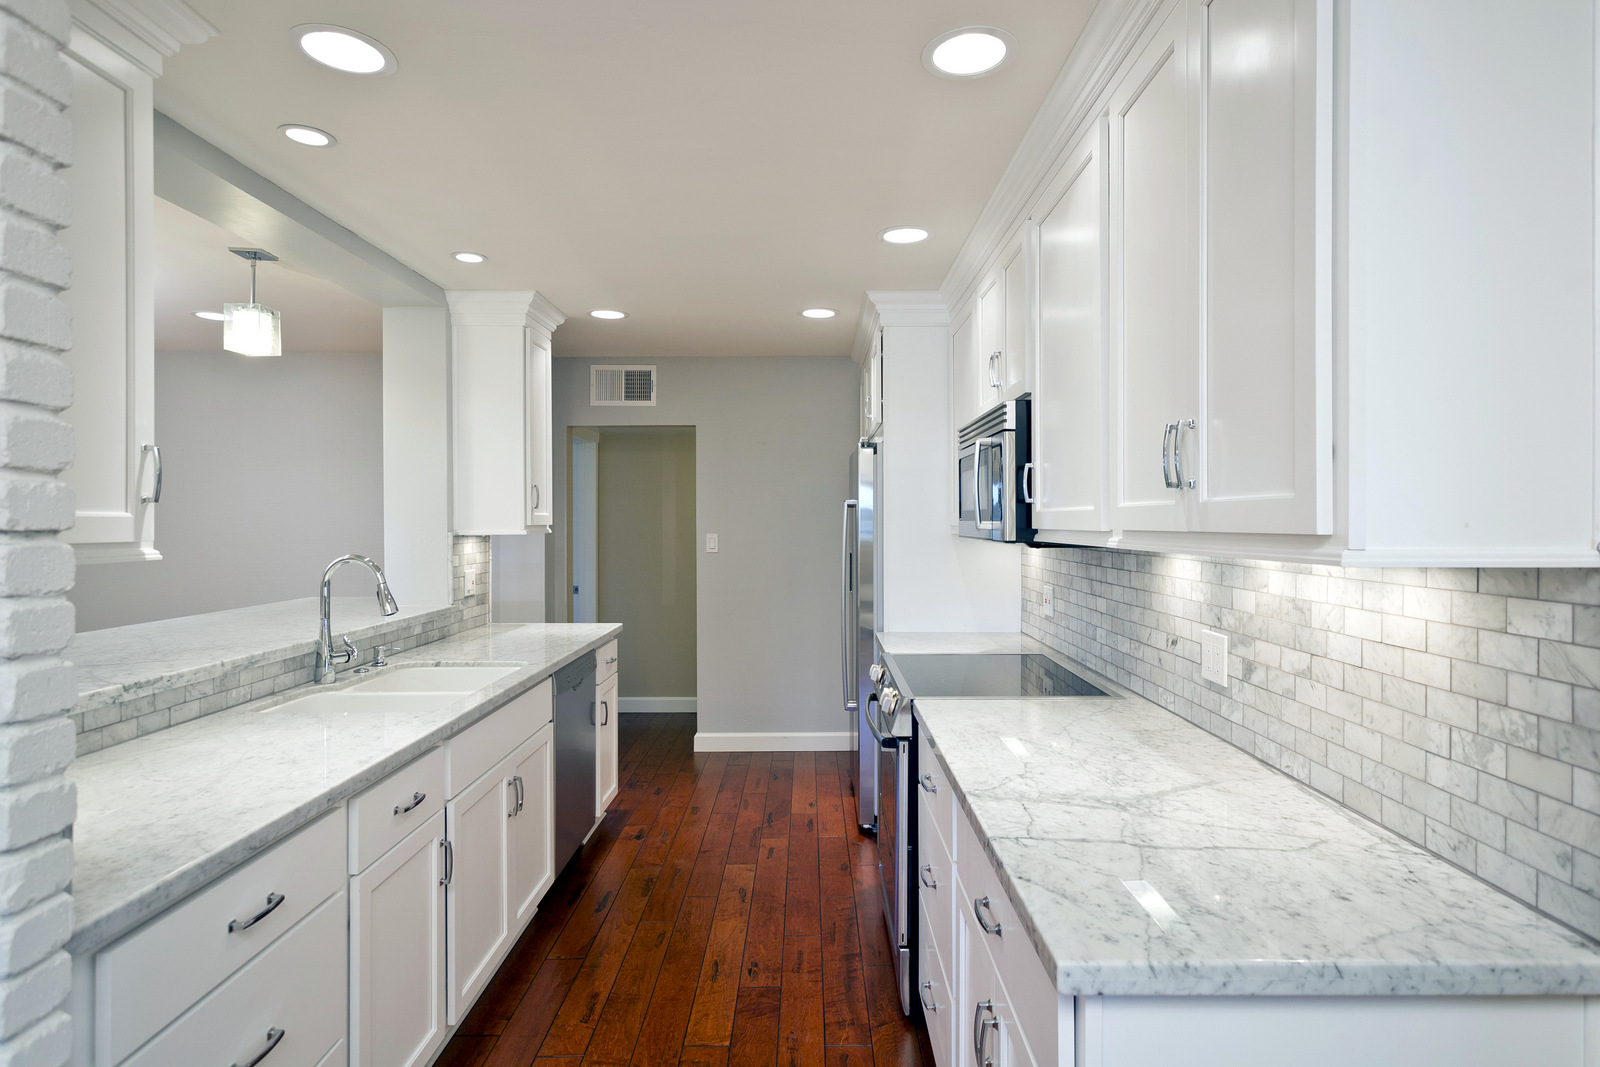 cabinets kitchen remodeling phoenix az Phoenix AZ Kitchen Cabinets in White